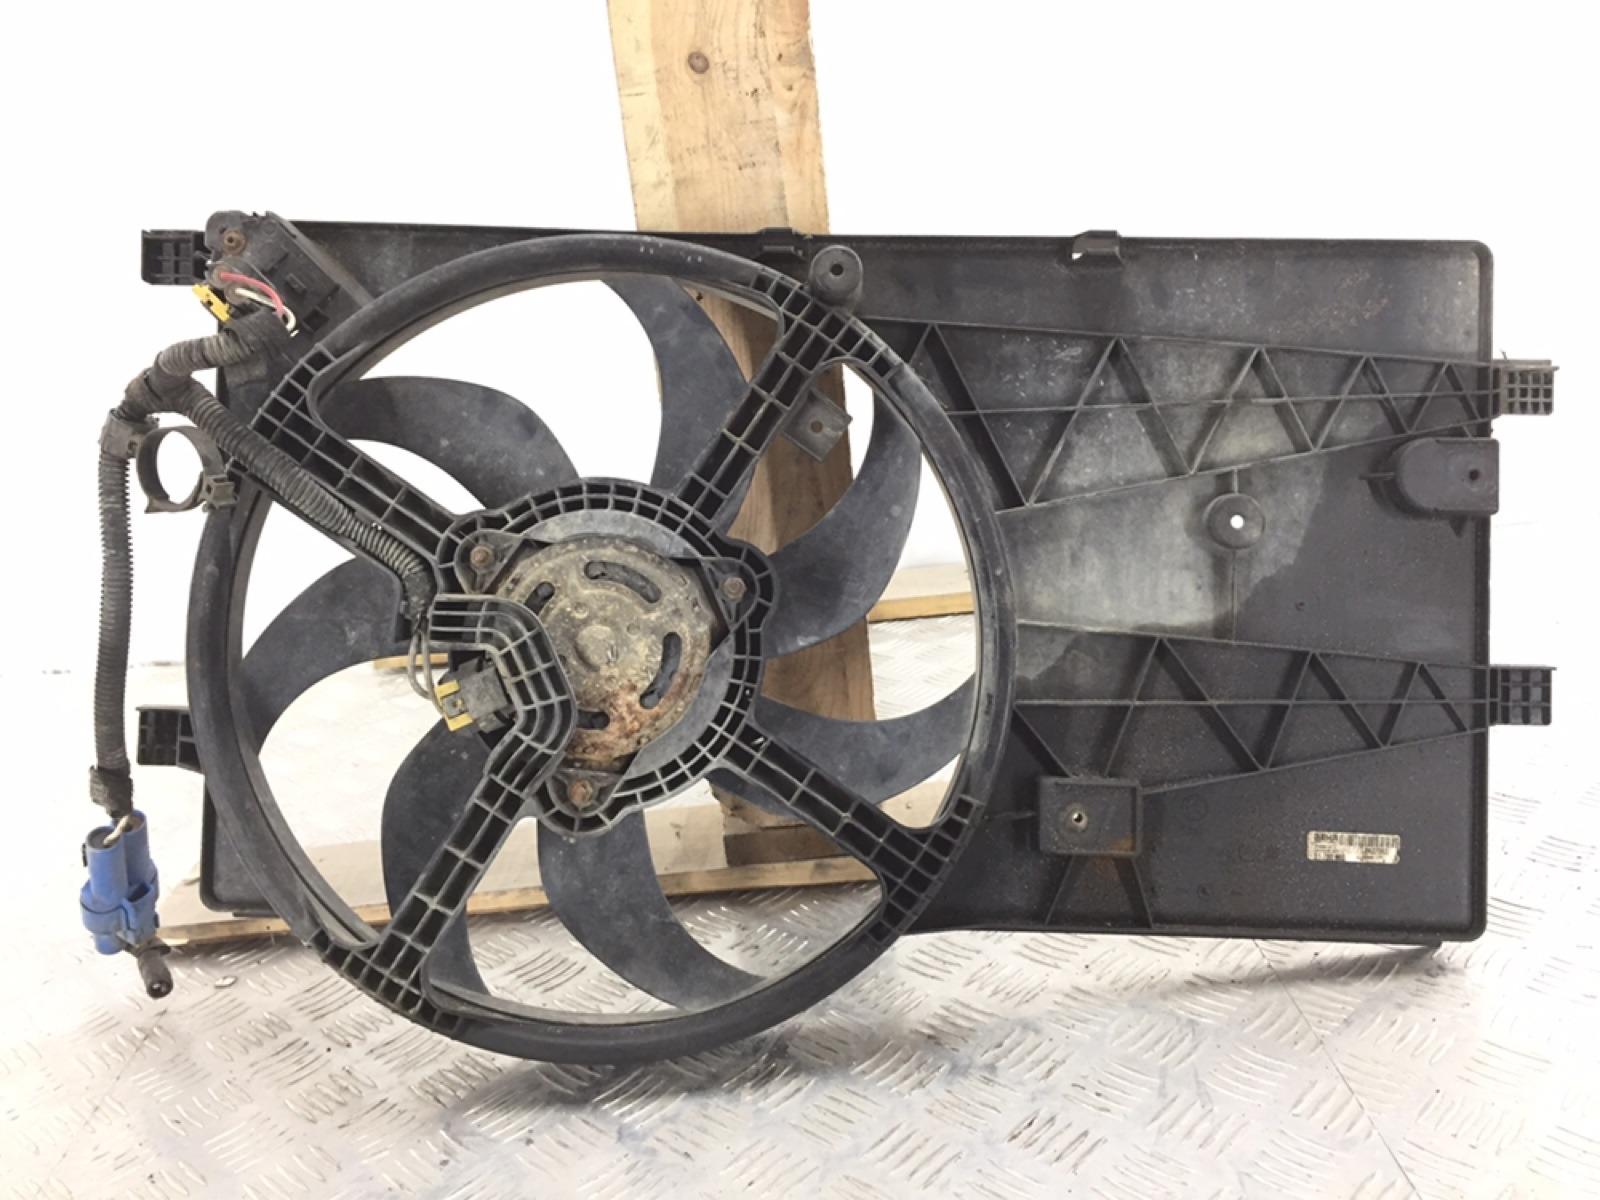 Вентилятор радиатора Peugeot Bipper 1.4 TD 2009 (б/у)